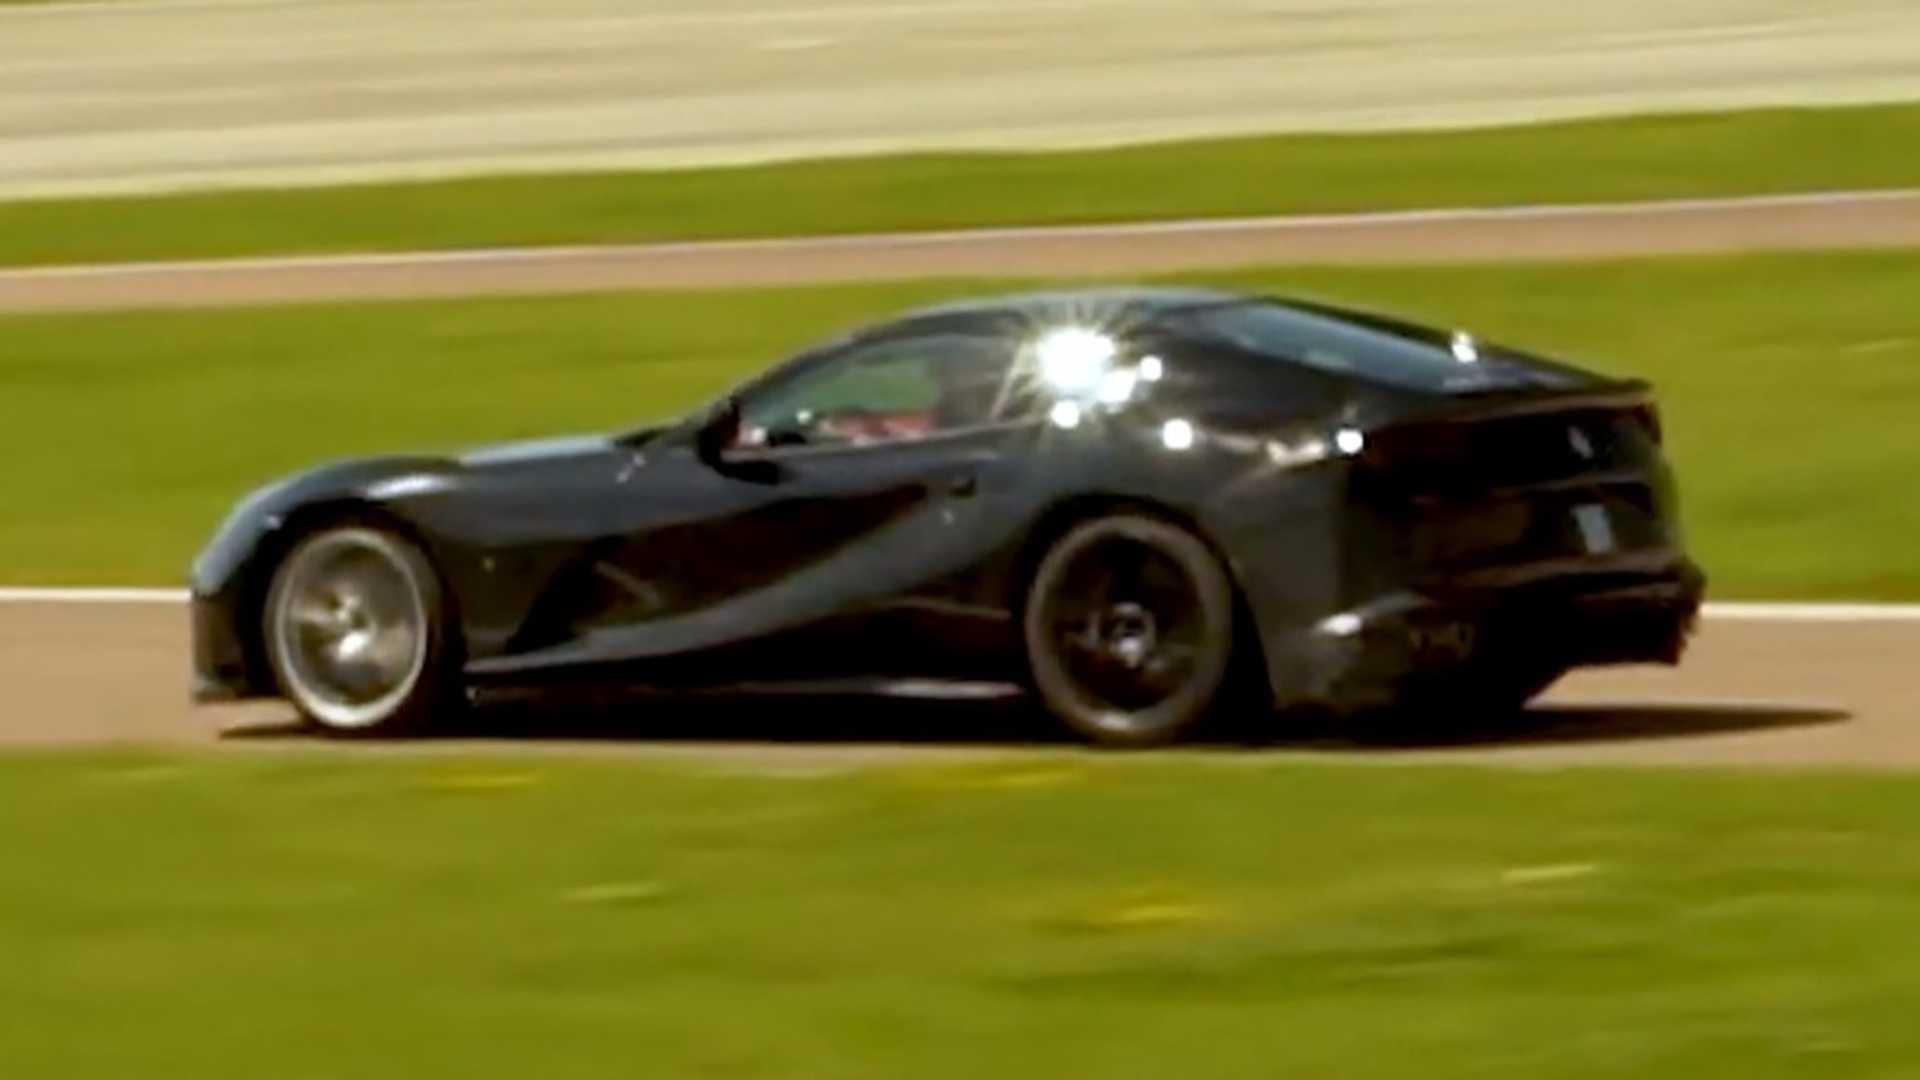 Ferrari 812 hardcore version screenshot from spy video